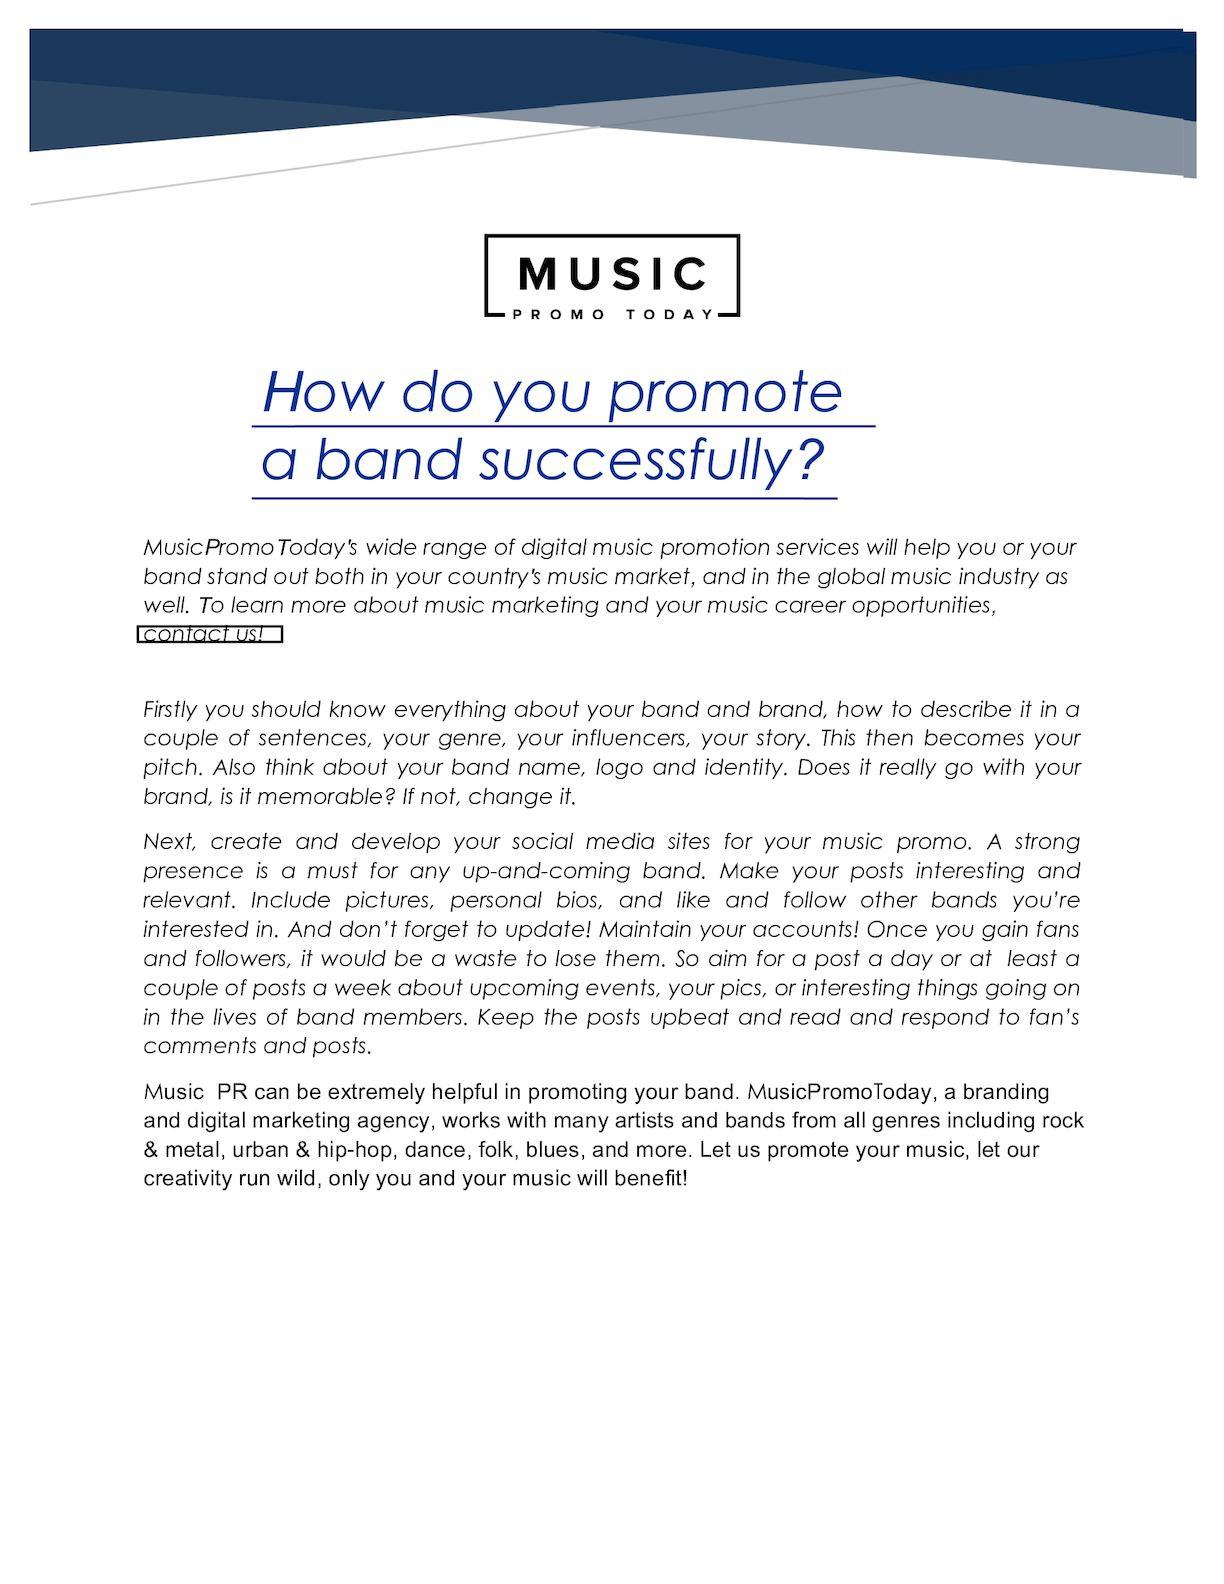 Calaméo - music pr companies